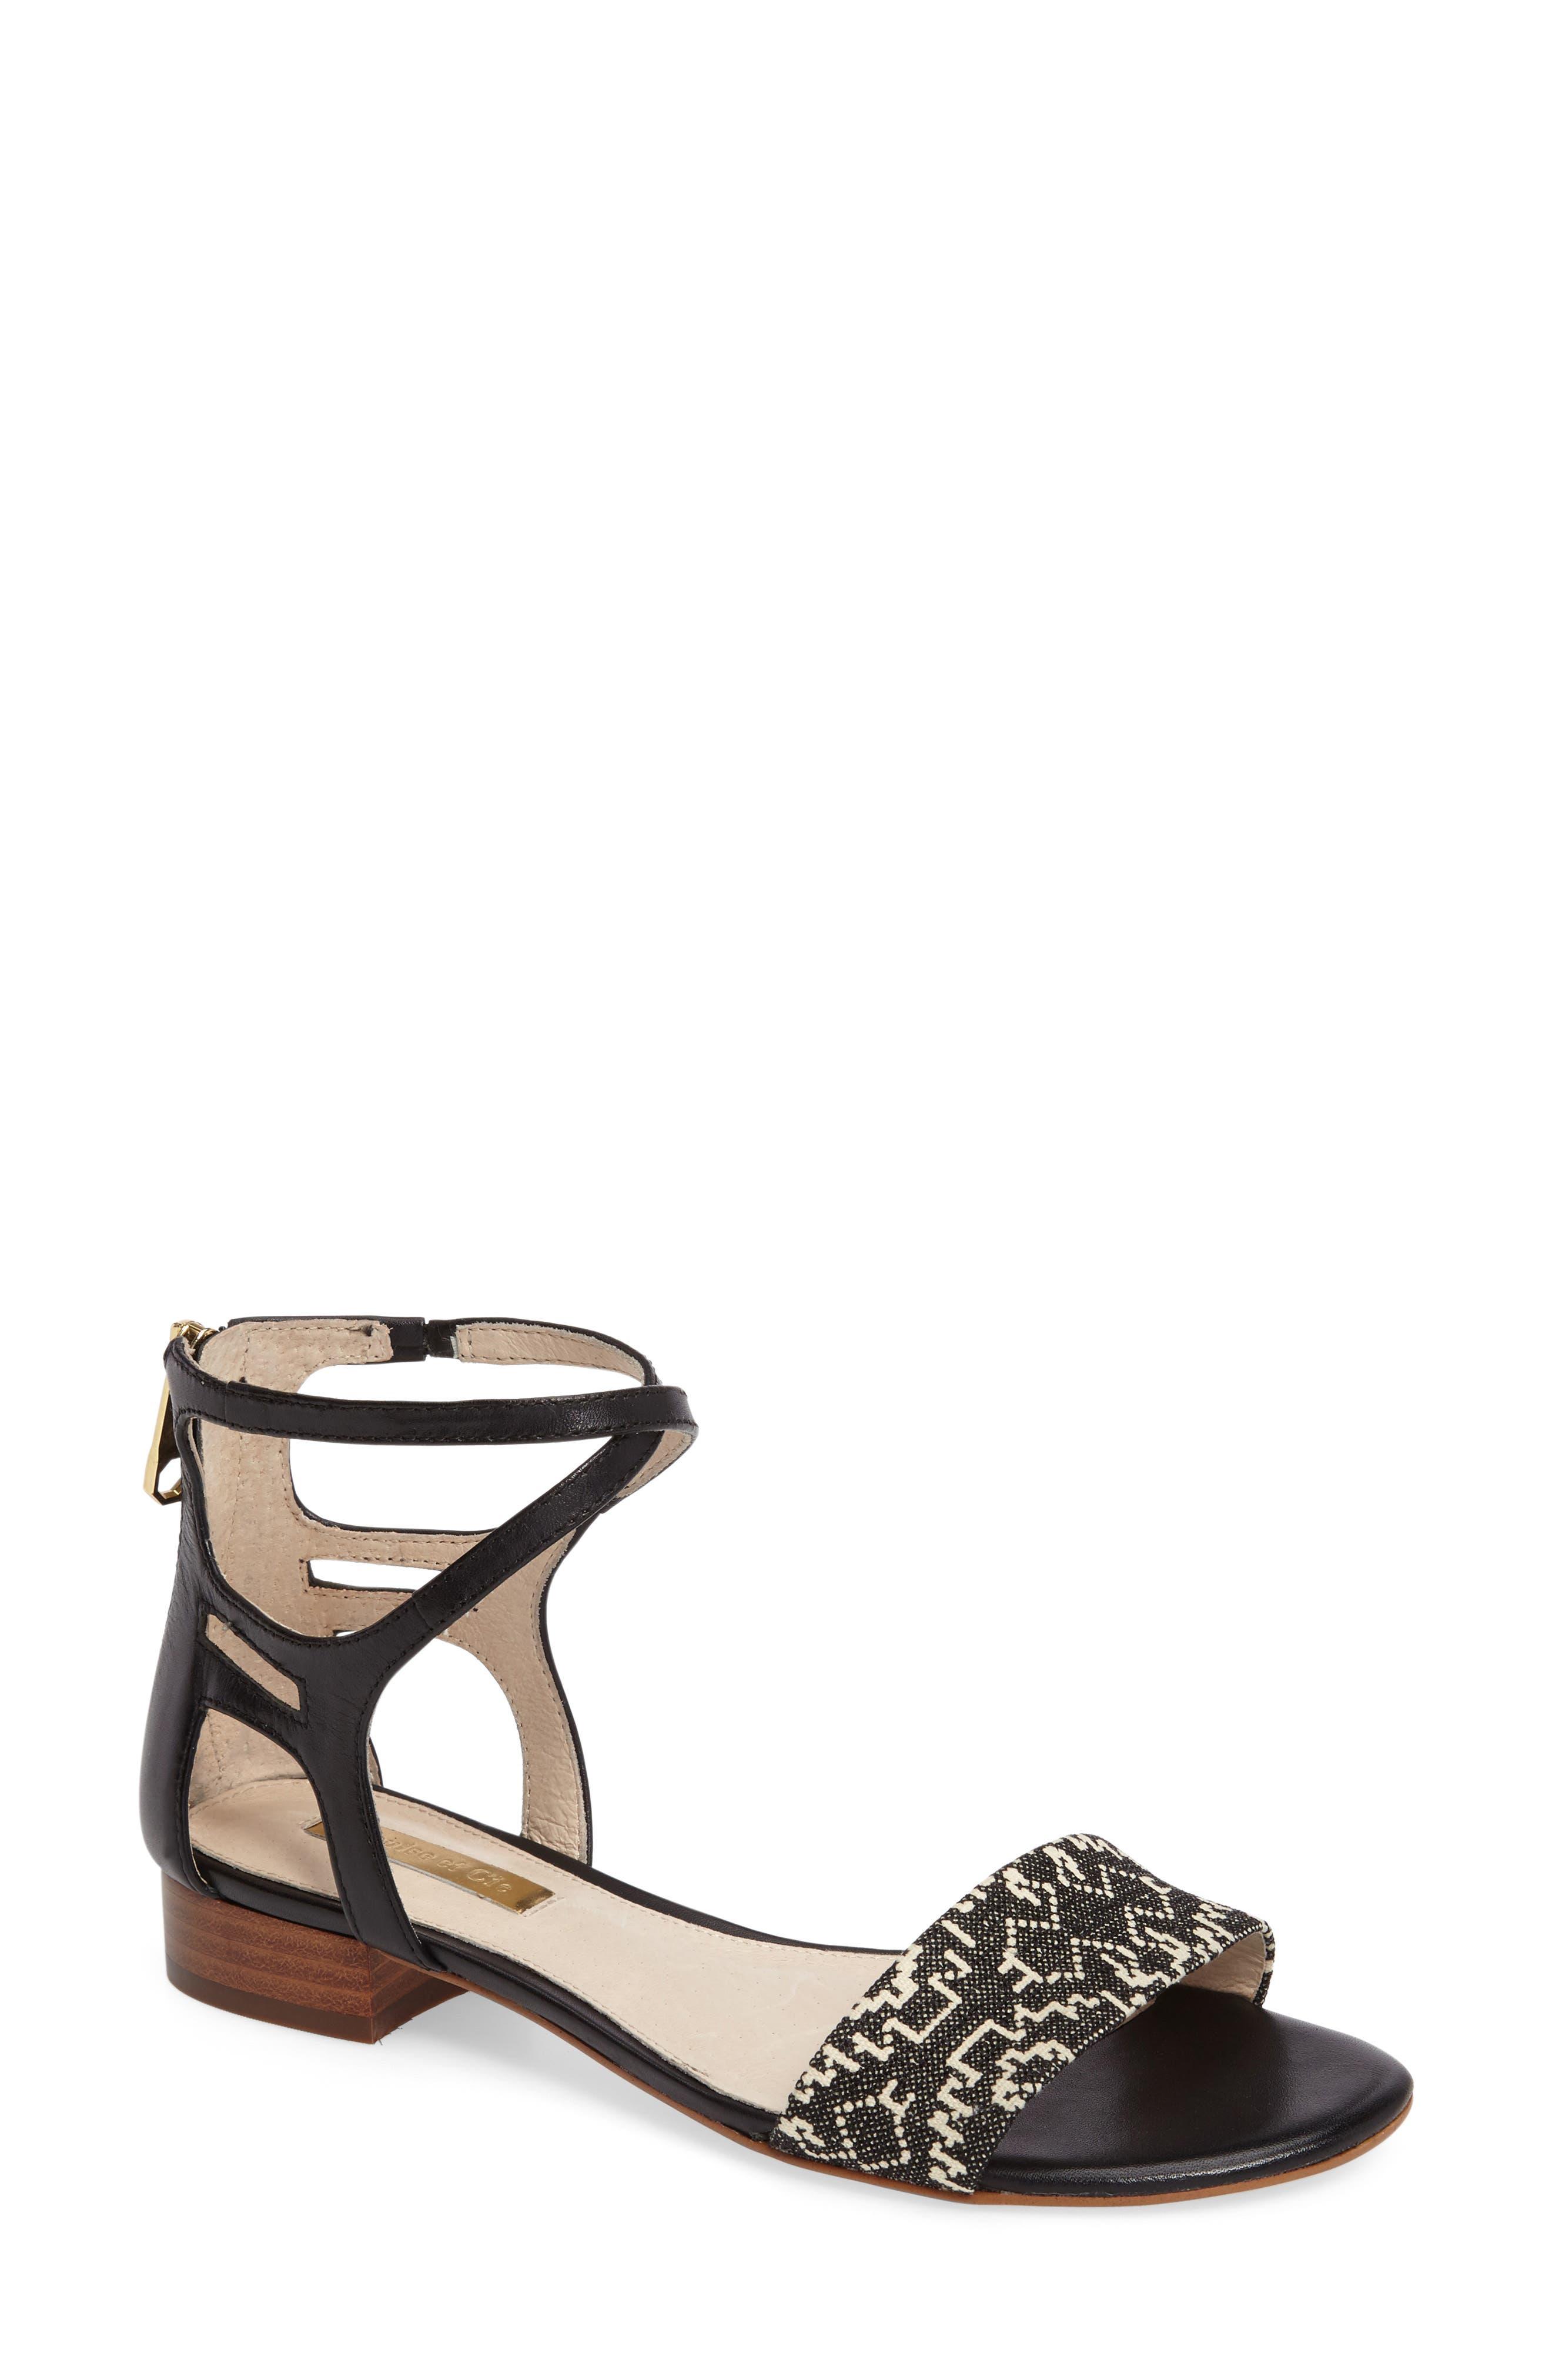 Adley Ankle Strap Sandal,                         Main,                         color, 002